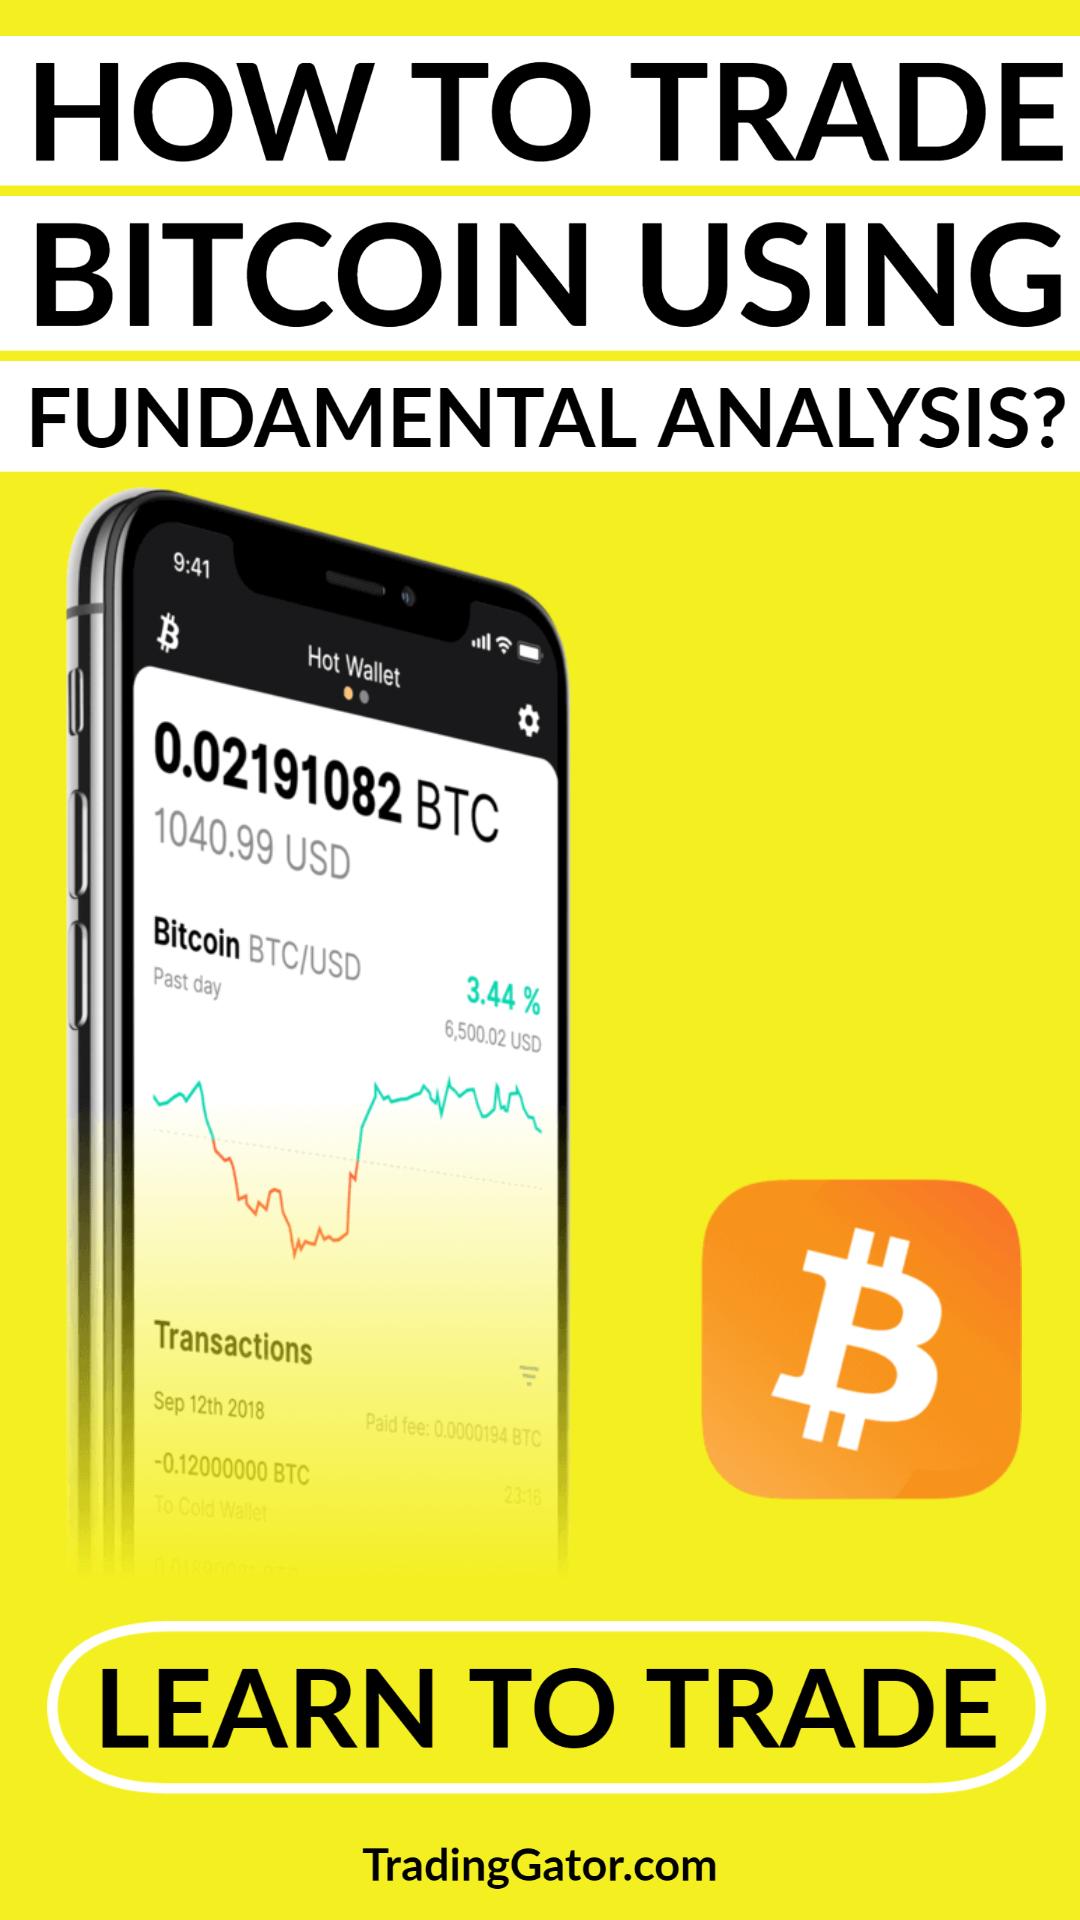 How To Trade Bitcoin Using Fundamental Analysis Fundamental Analysis Bitcoin Online Broker